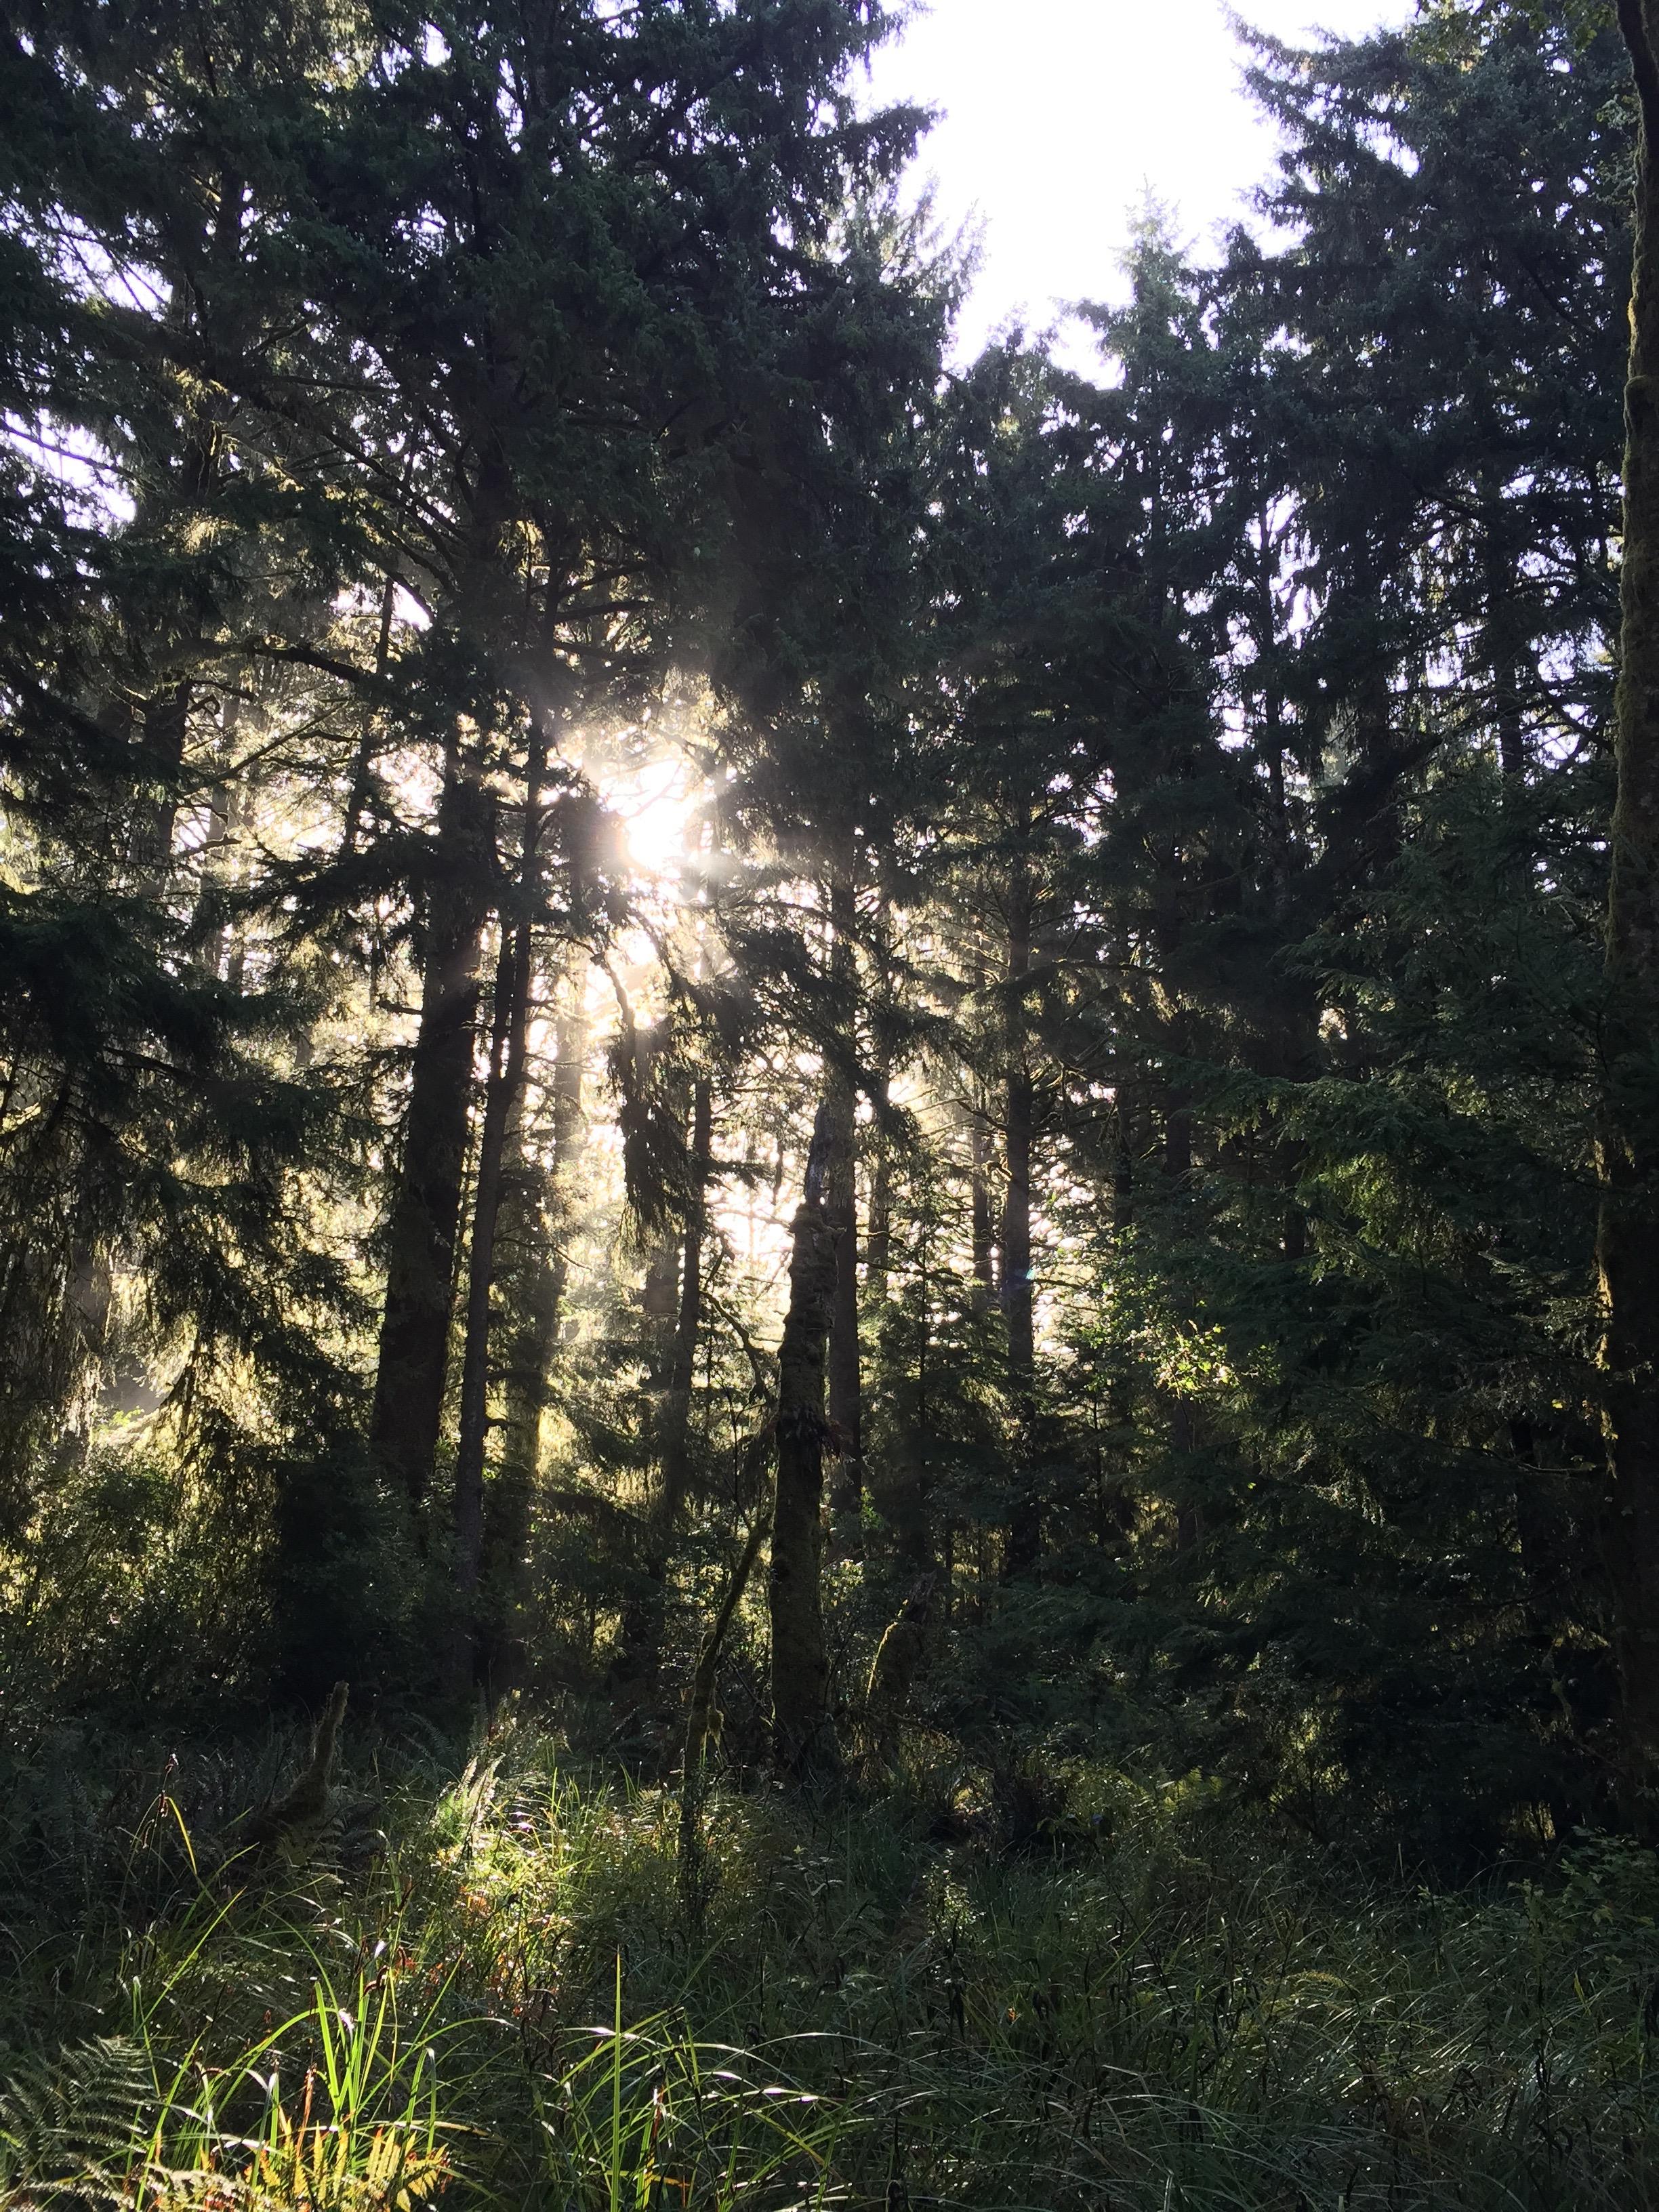 The sun shining through the trees.